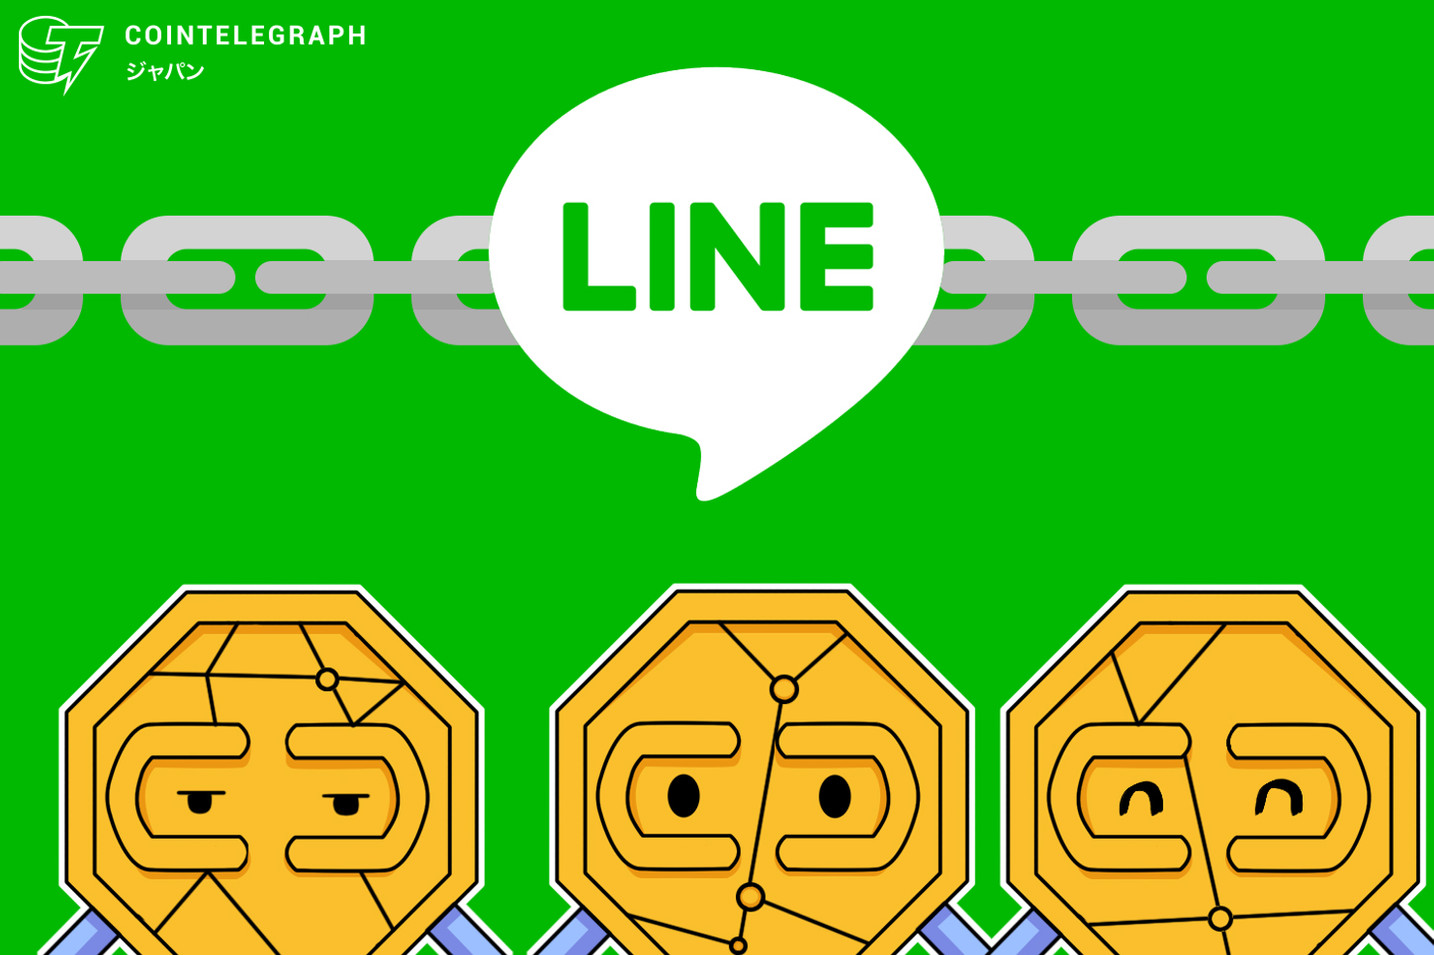 LINEの独自仮想通貨「LINK」が取扱開始、今後の分散型アプリ開発やLINK使用はどうなるか?